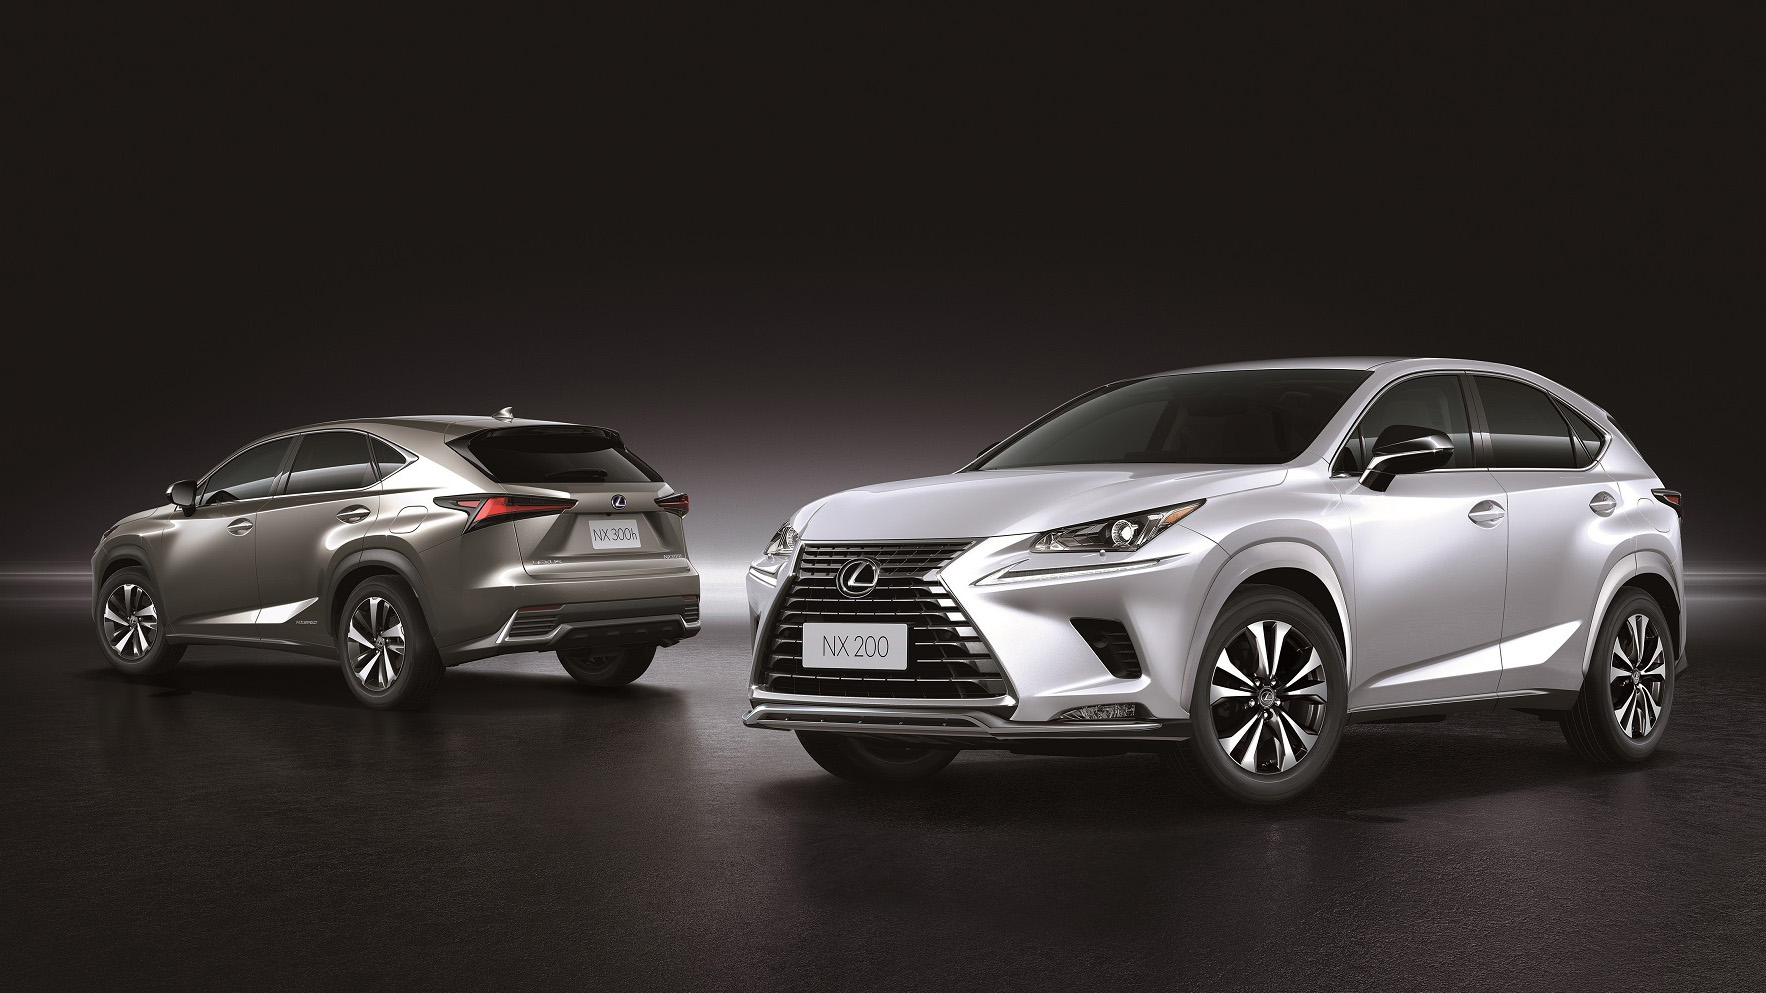 Lexus NX 200 都會風尚車型 157 萬起,配備升級不加價